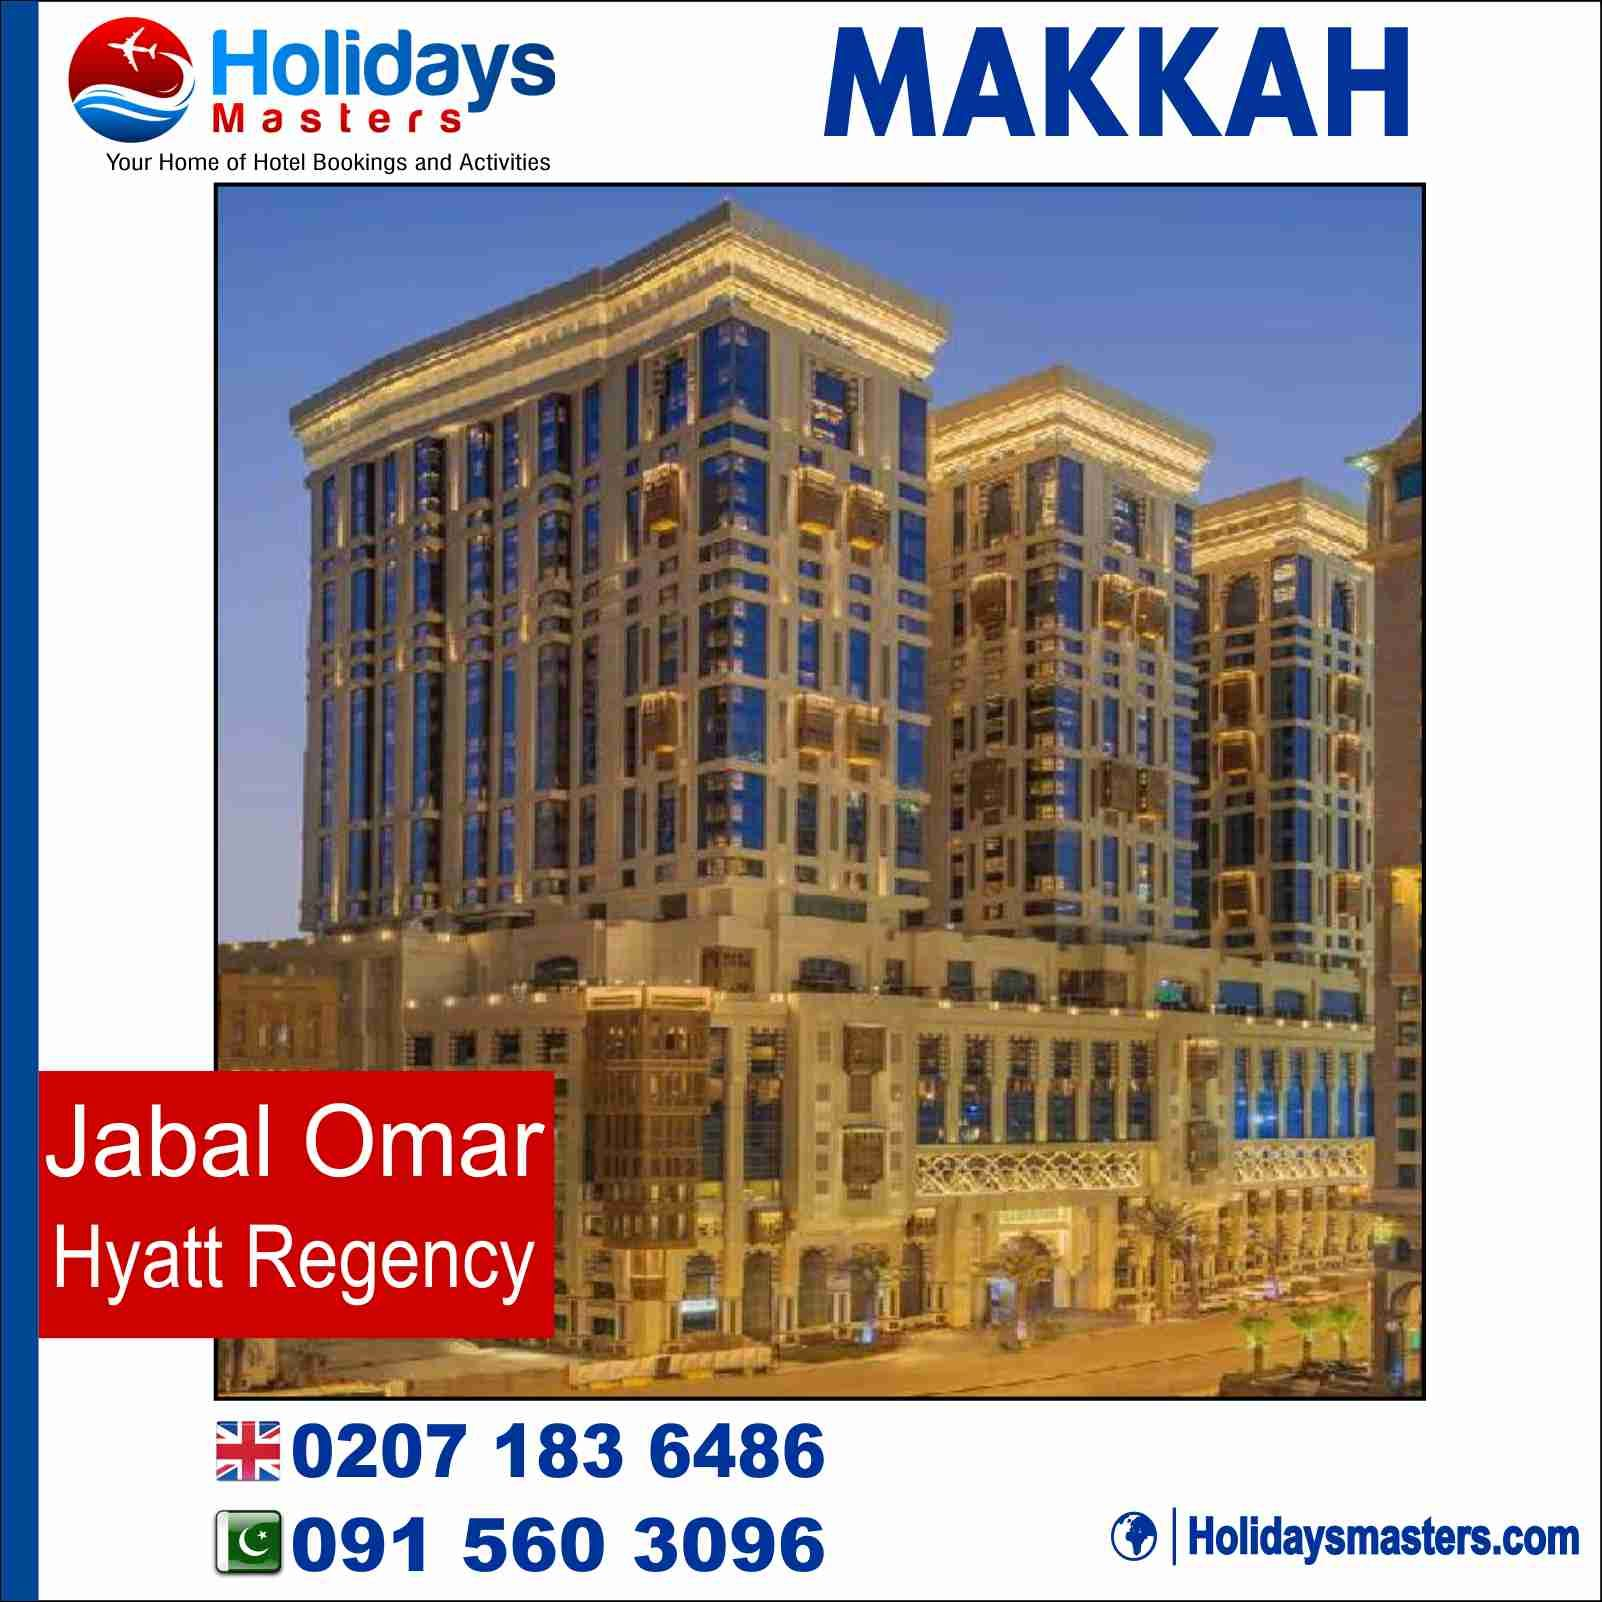 Jabal Omar Hyatt Regency Makkah Cheap Hotels Hotel Deals Cheap Hotel Deals